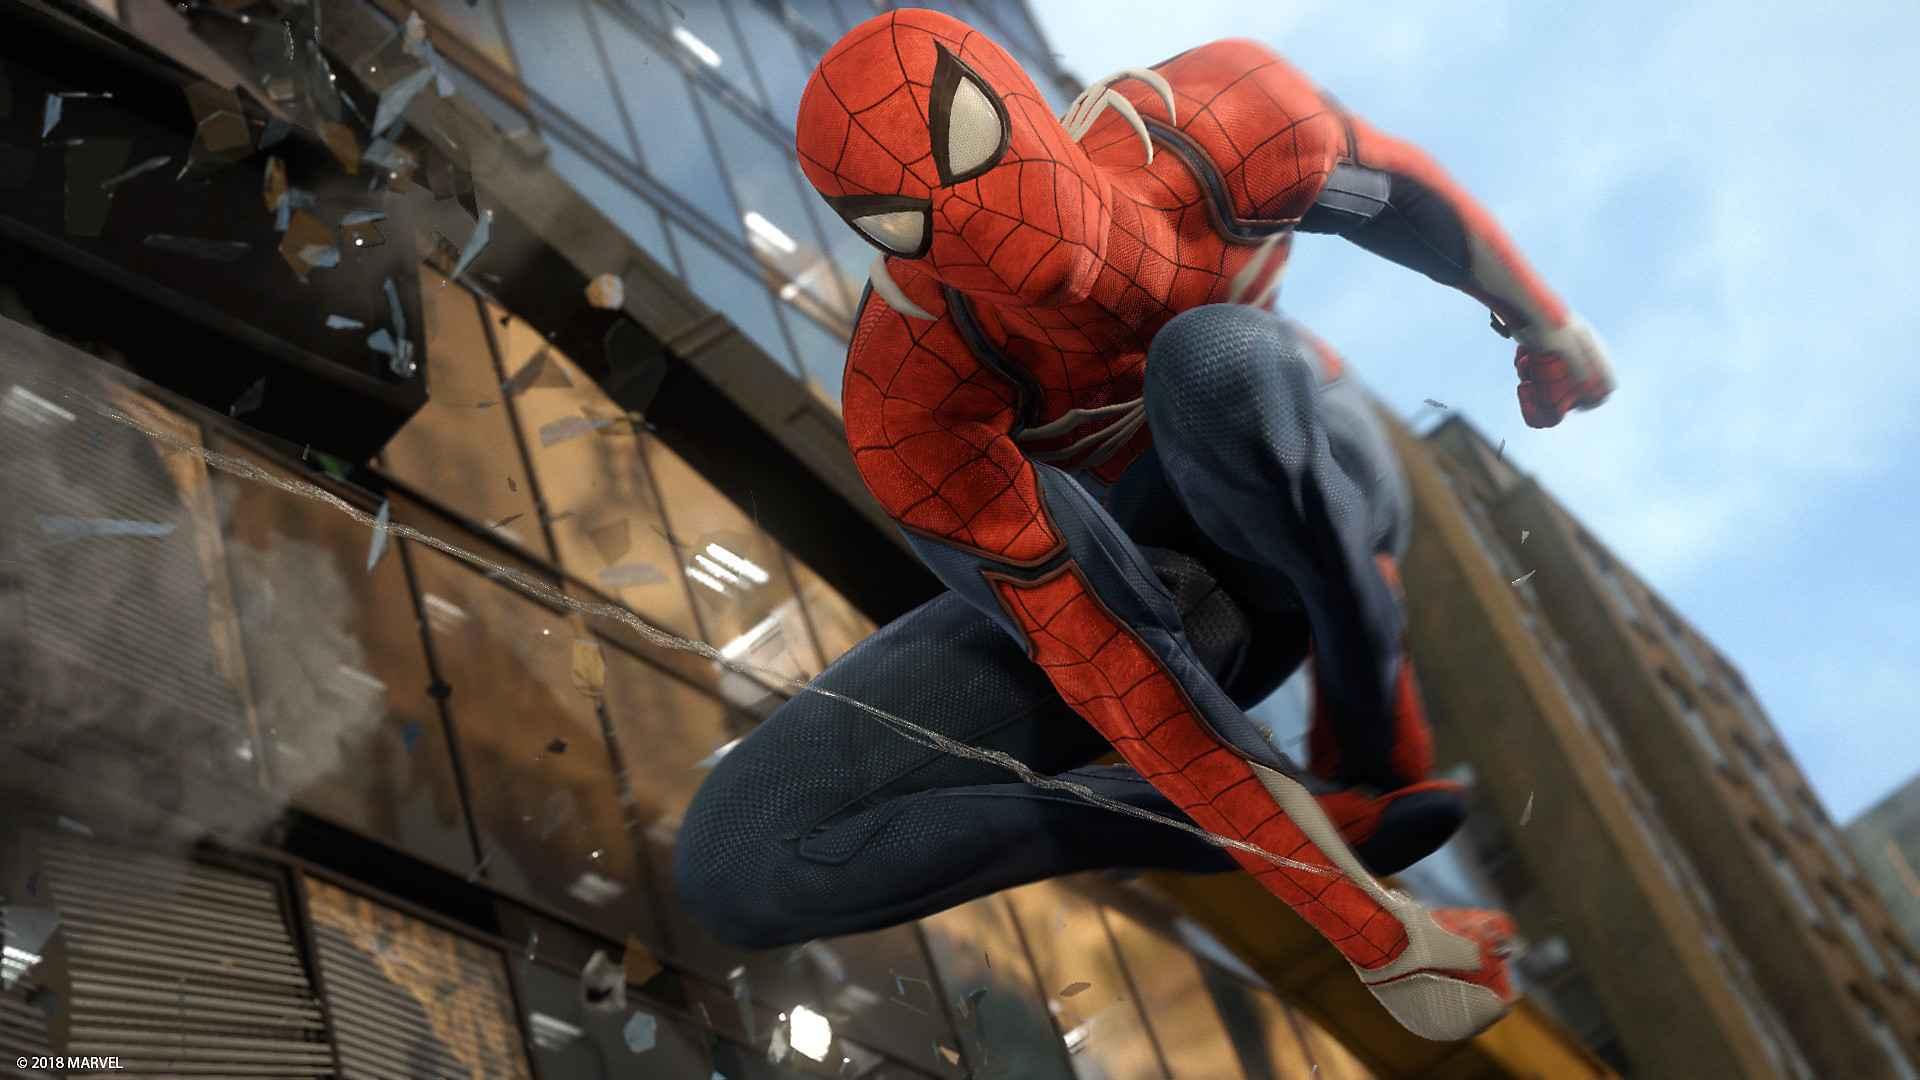 New Spider-Man Screenshots Look Absolutely Stunning